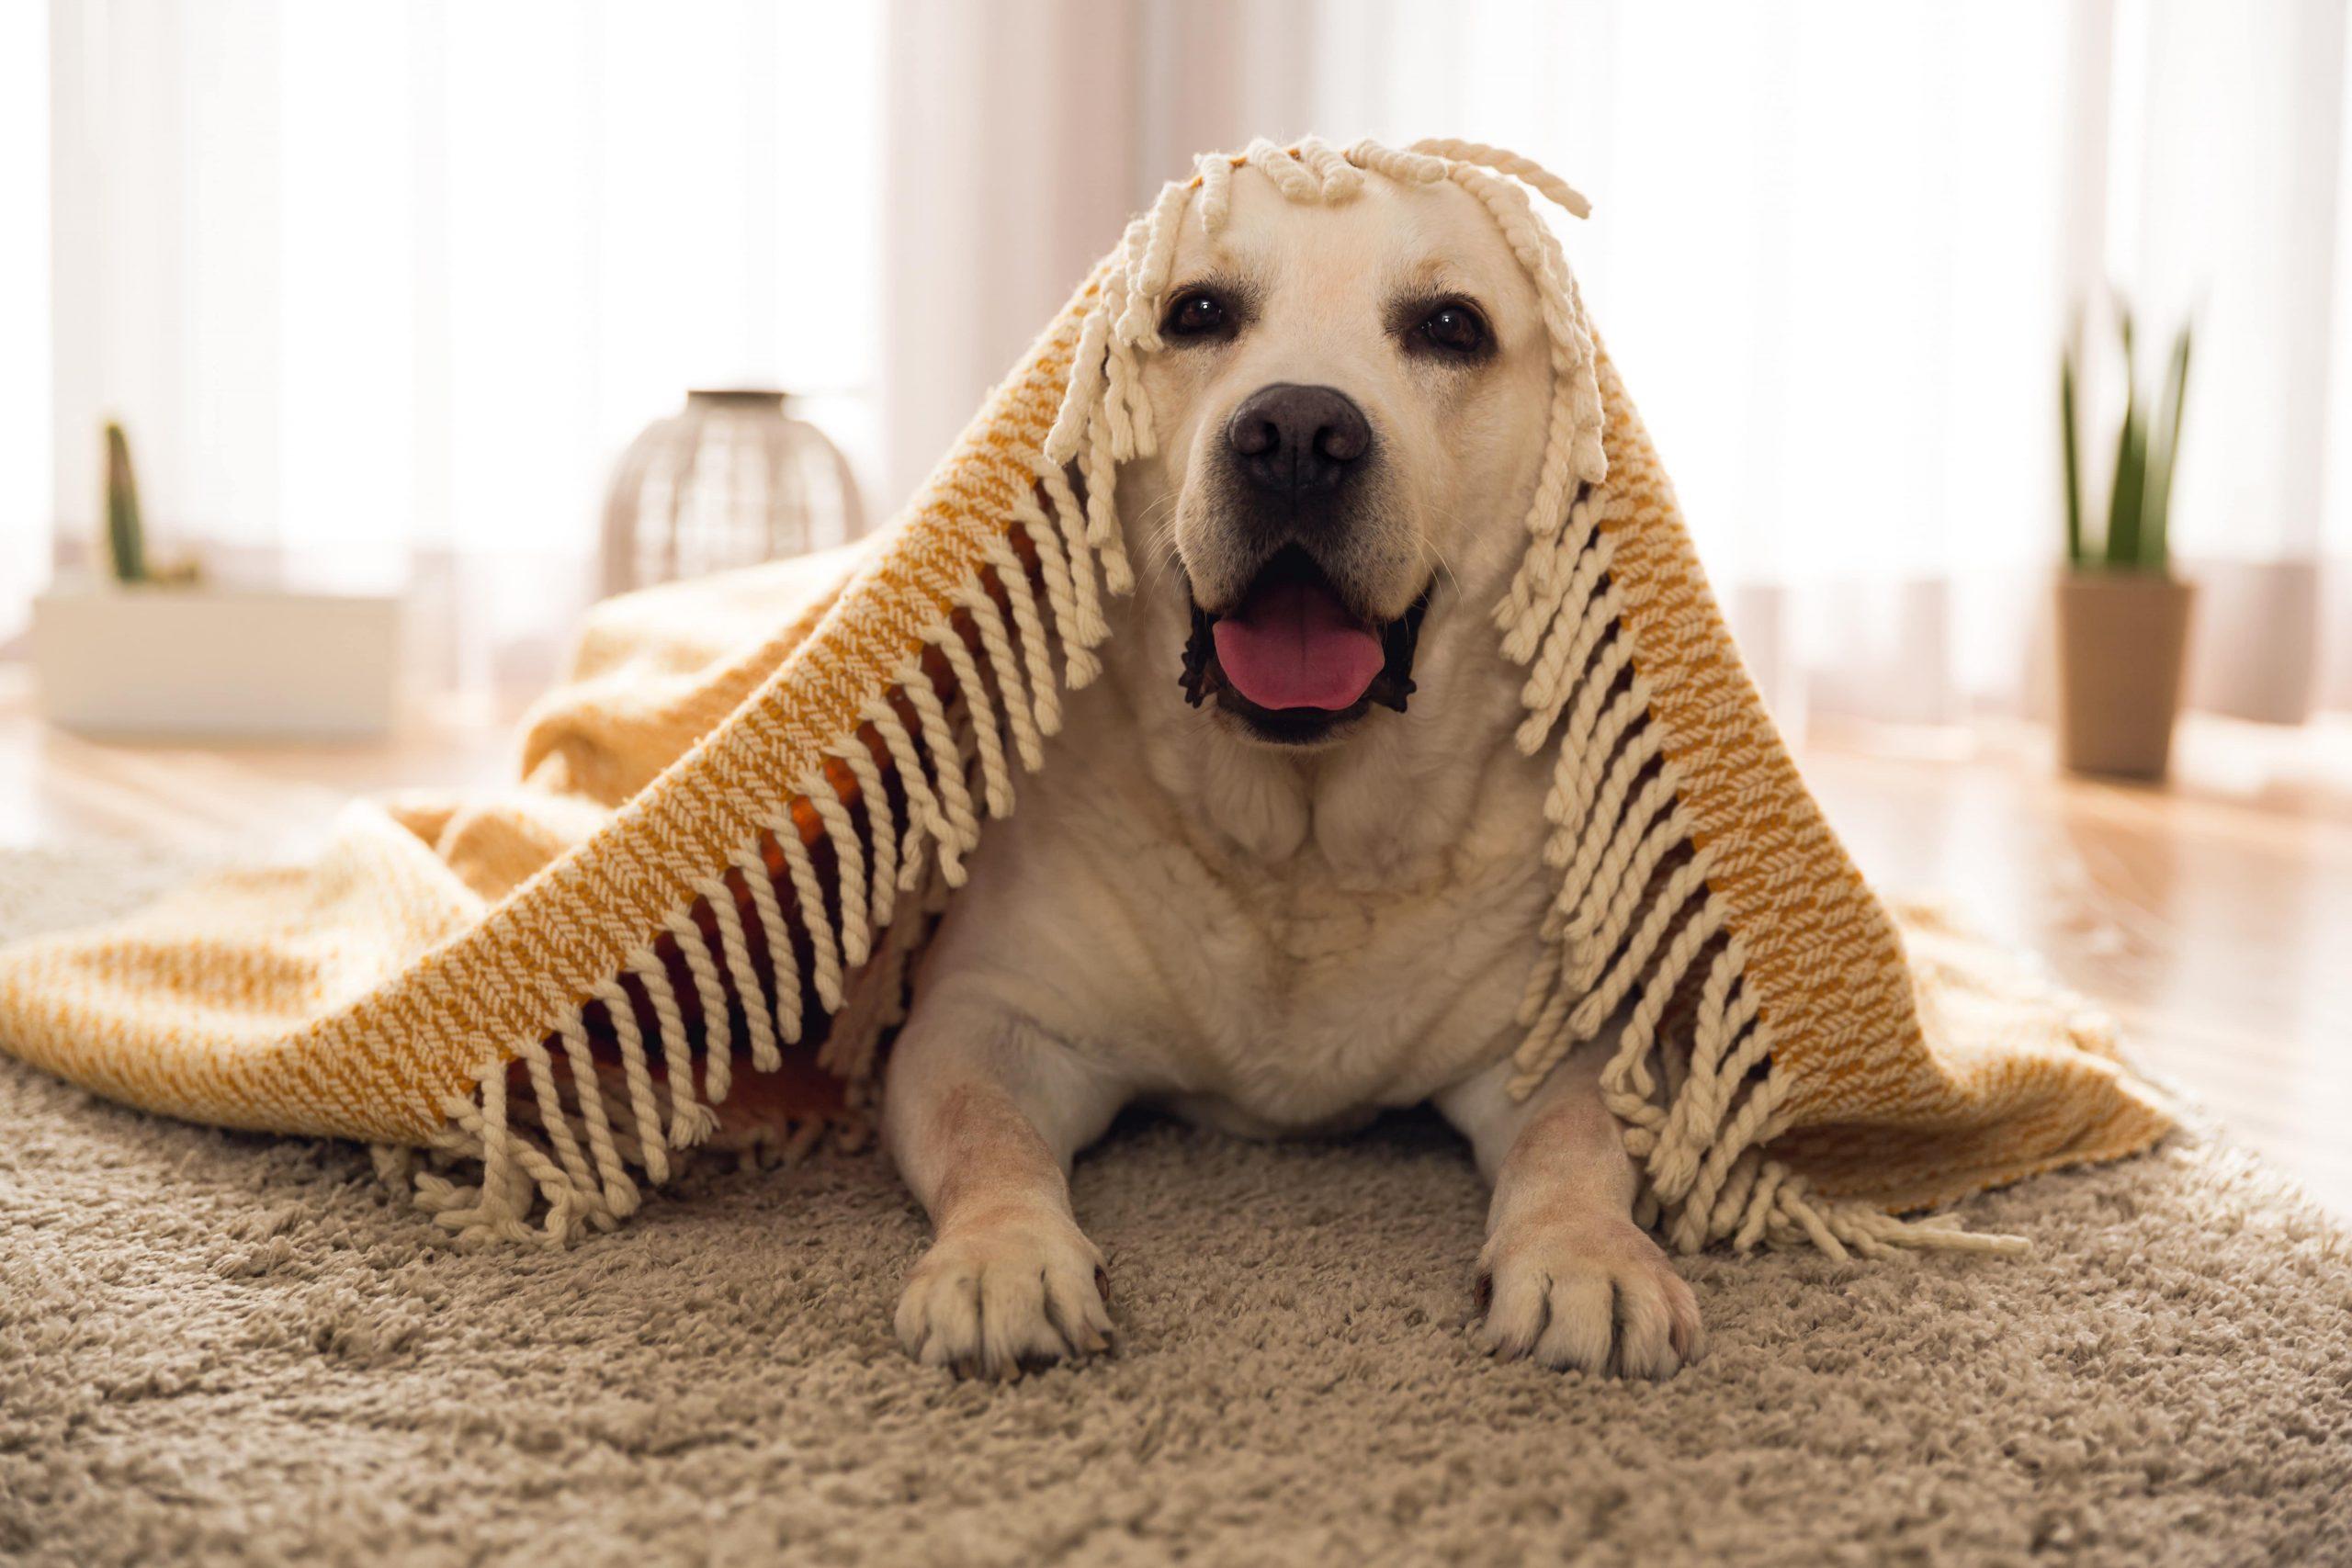 image of big dog under blanket in apartment